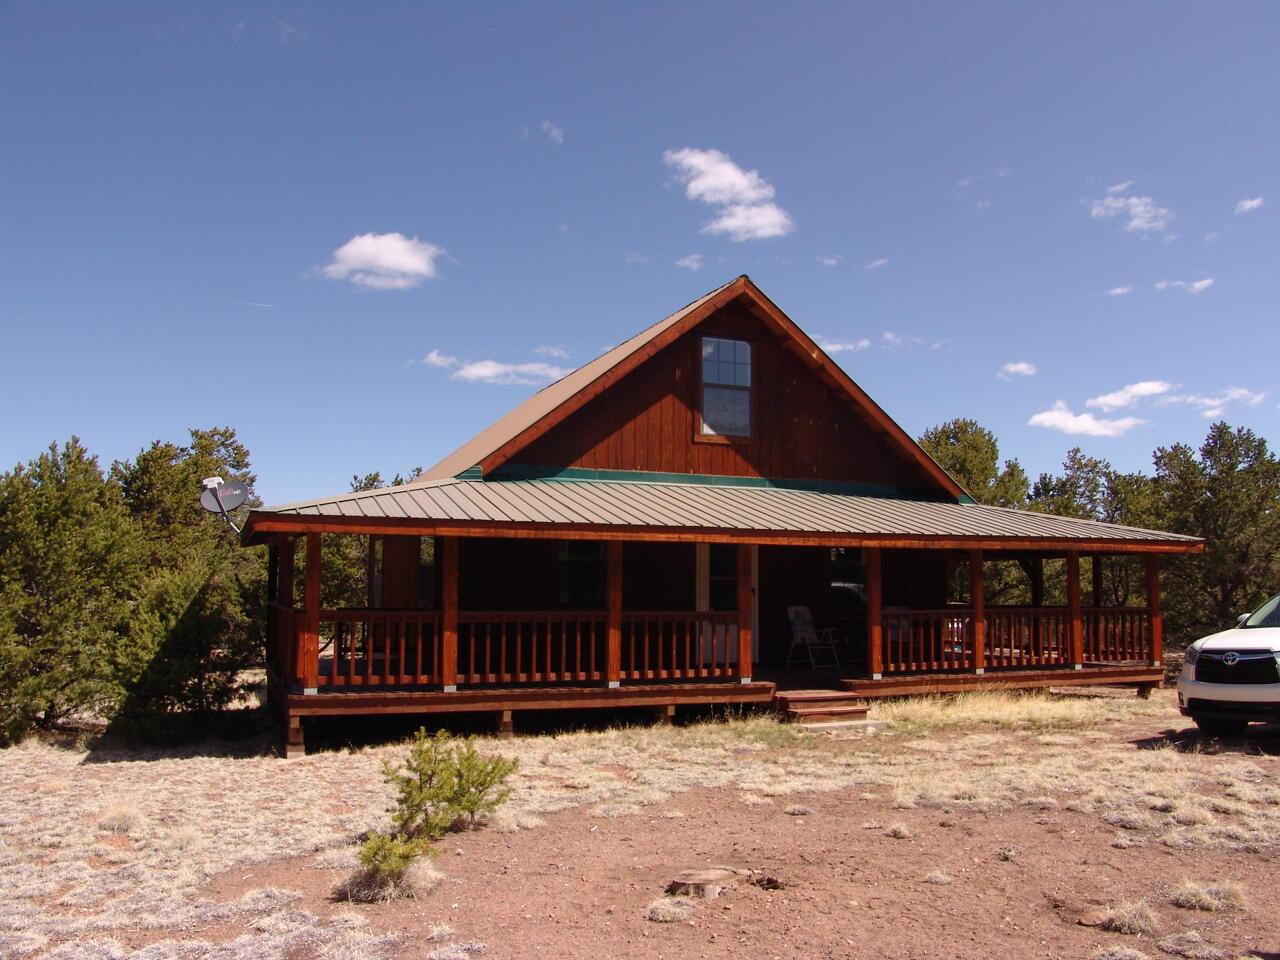 47 HORSE PEAK Trail #IV Property Photo - Datil, NM real estate listing